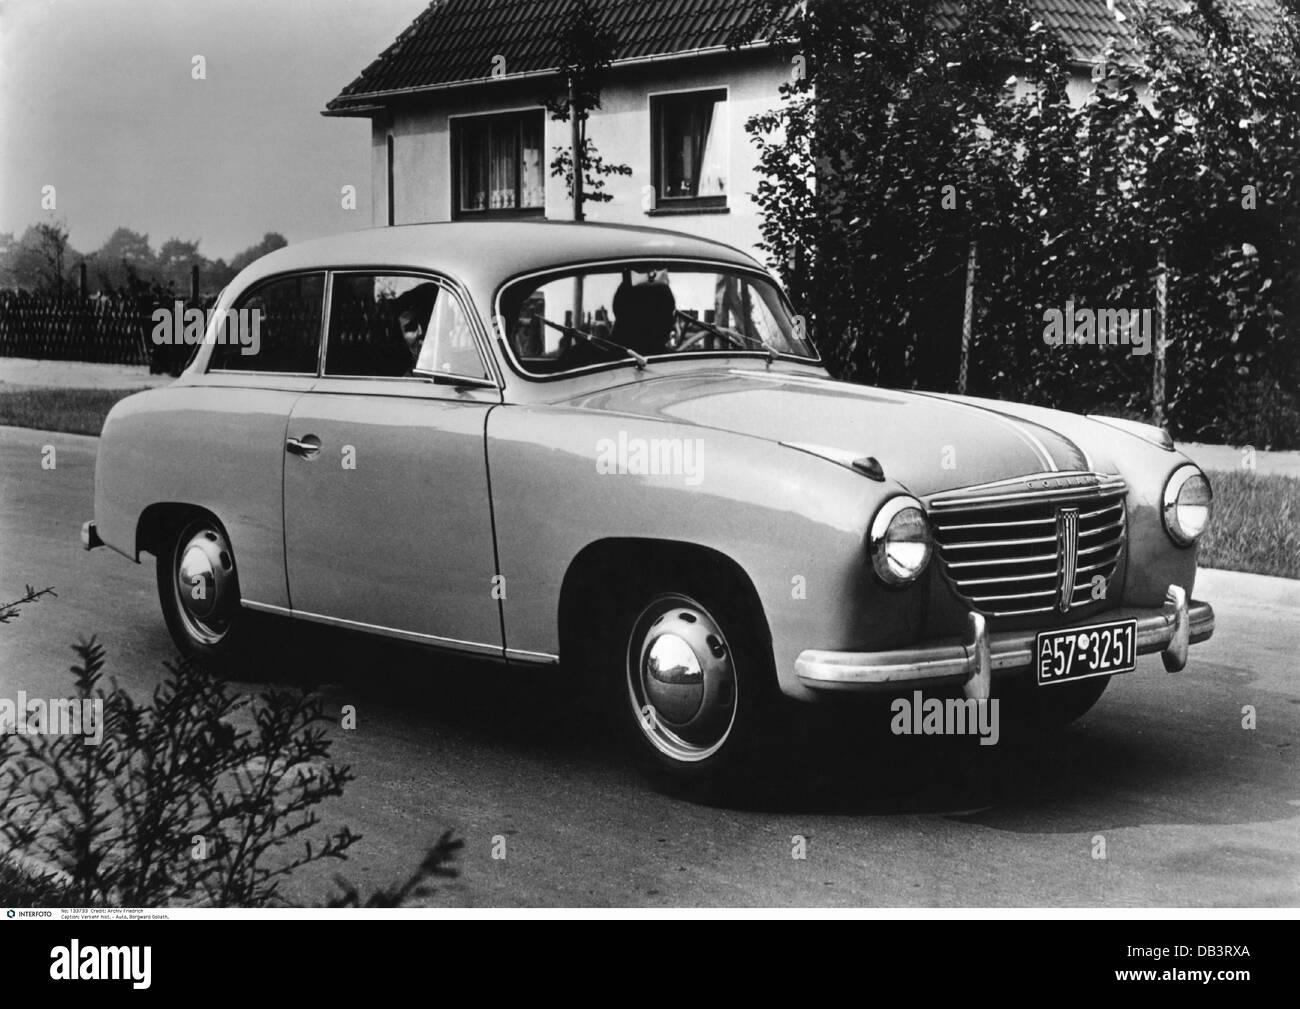 verkehr transport autos modelle borgward goliath 1950er jahre 50er jahre auto auto typ. Black Bedroom Furniture Sets. Home Design Ideas